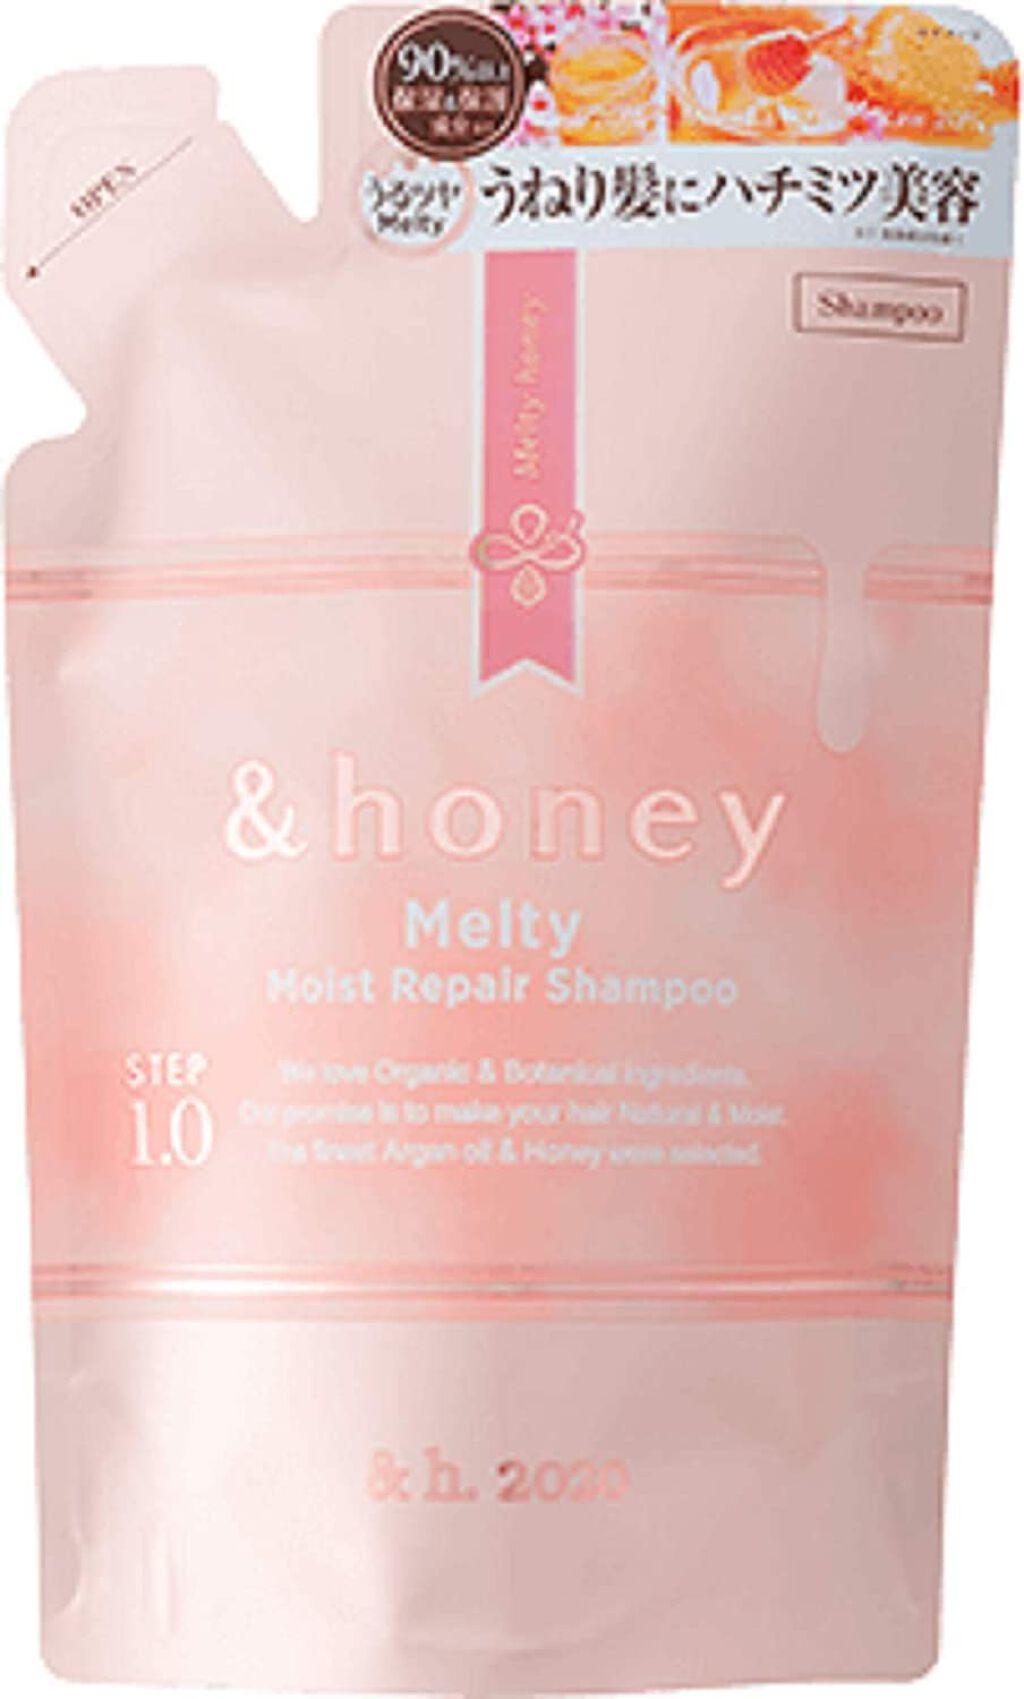 &honey Melty モイストリペア シャンプー1.0/モイストリペア ヘアトリートメント2.0 シャンプー(詰替え)